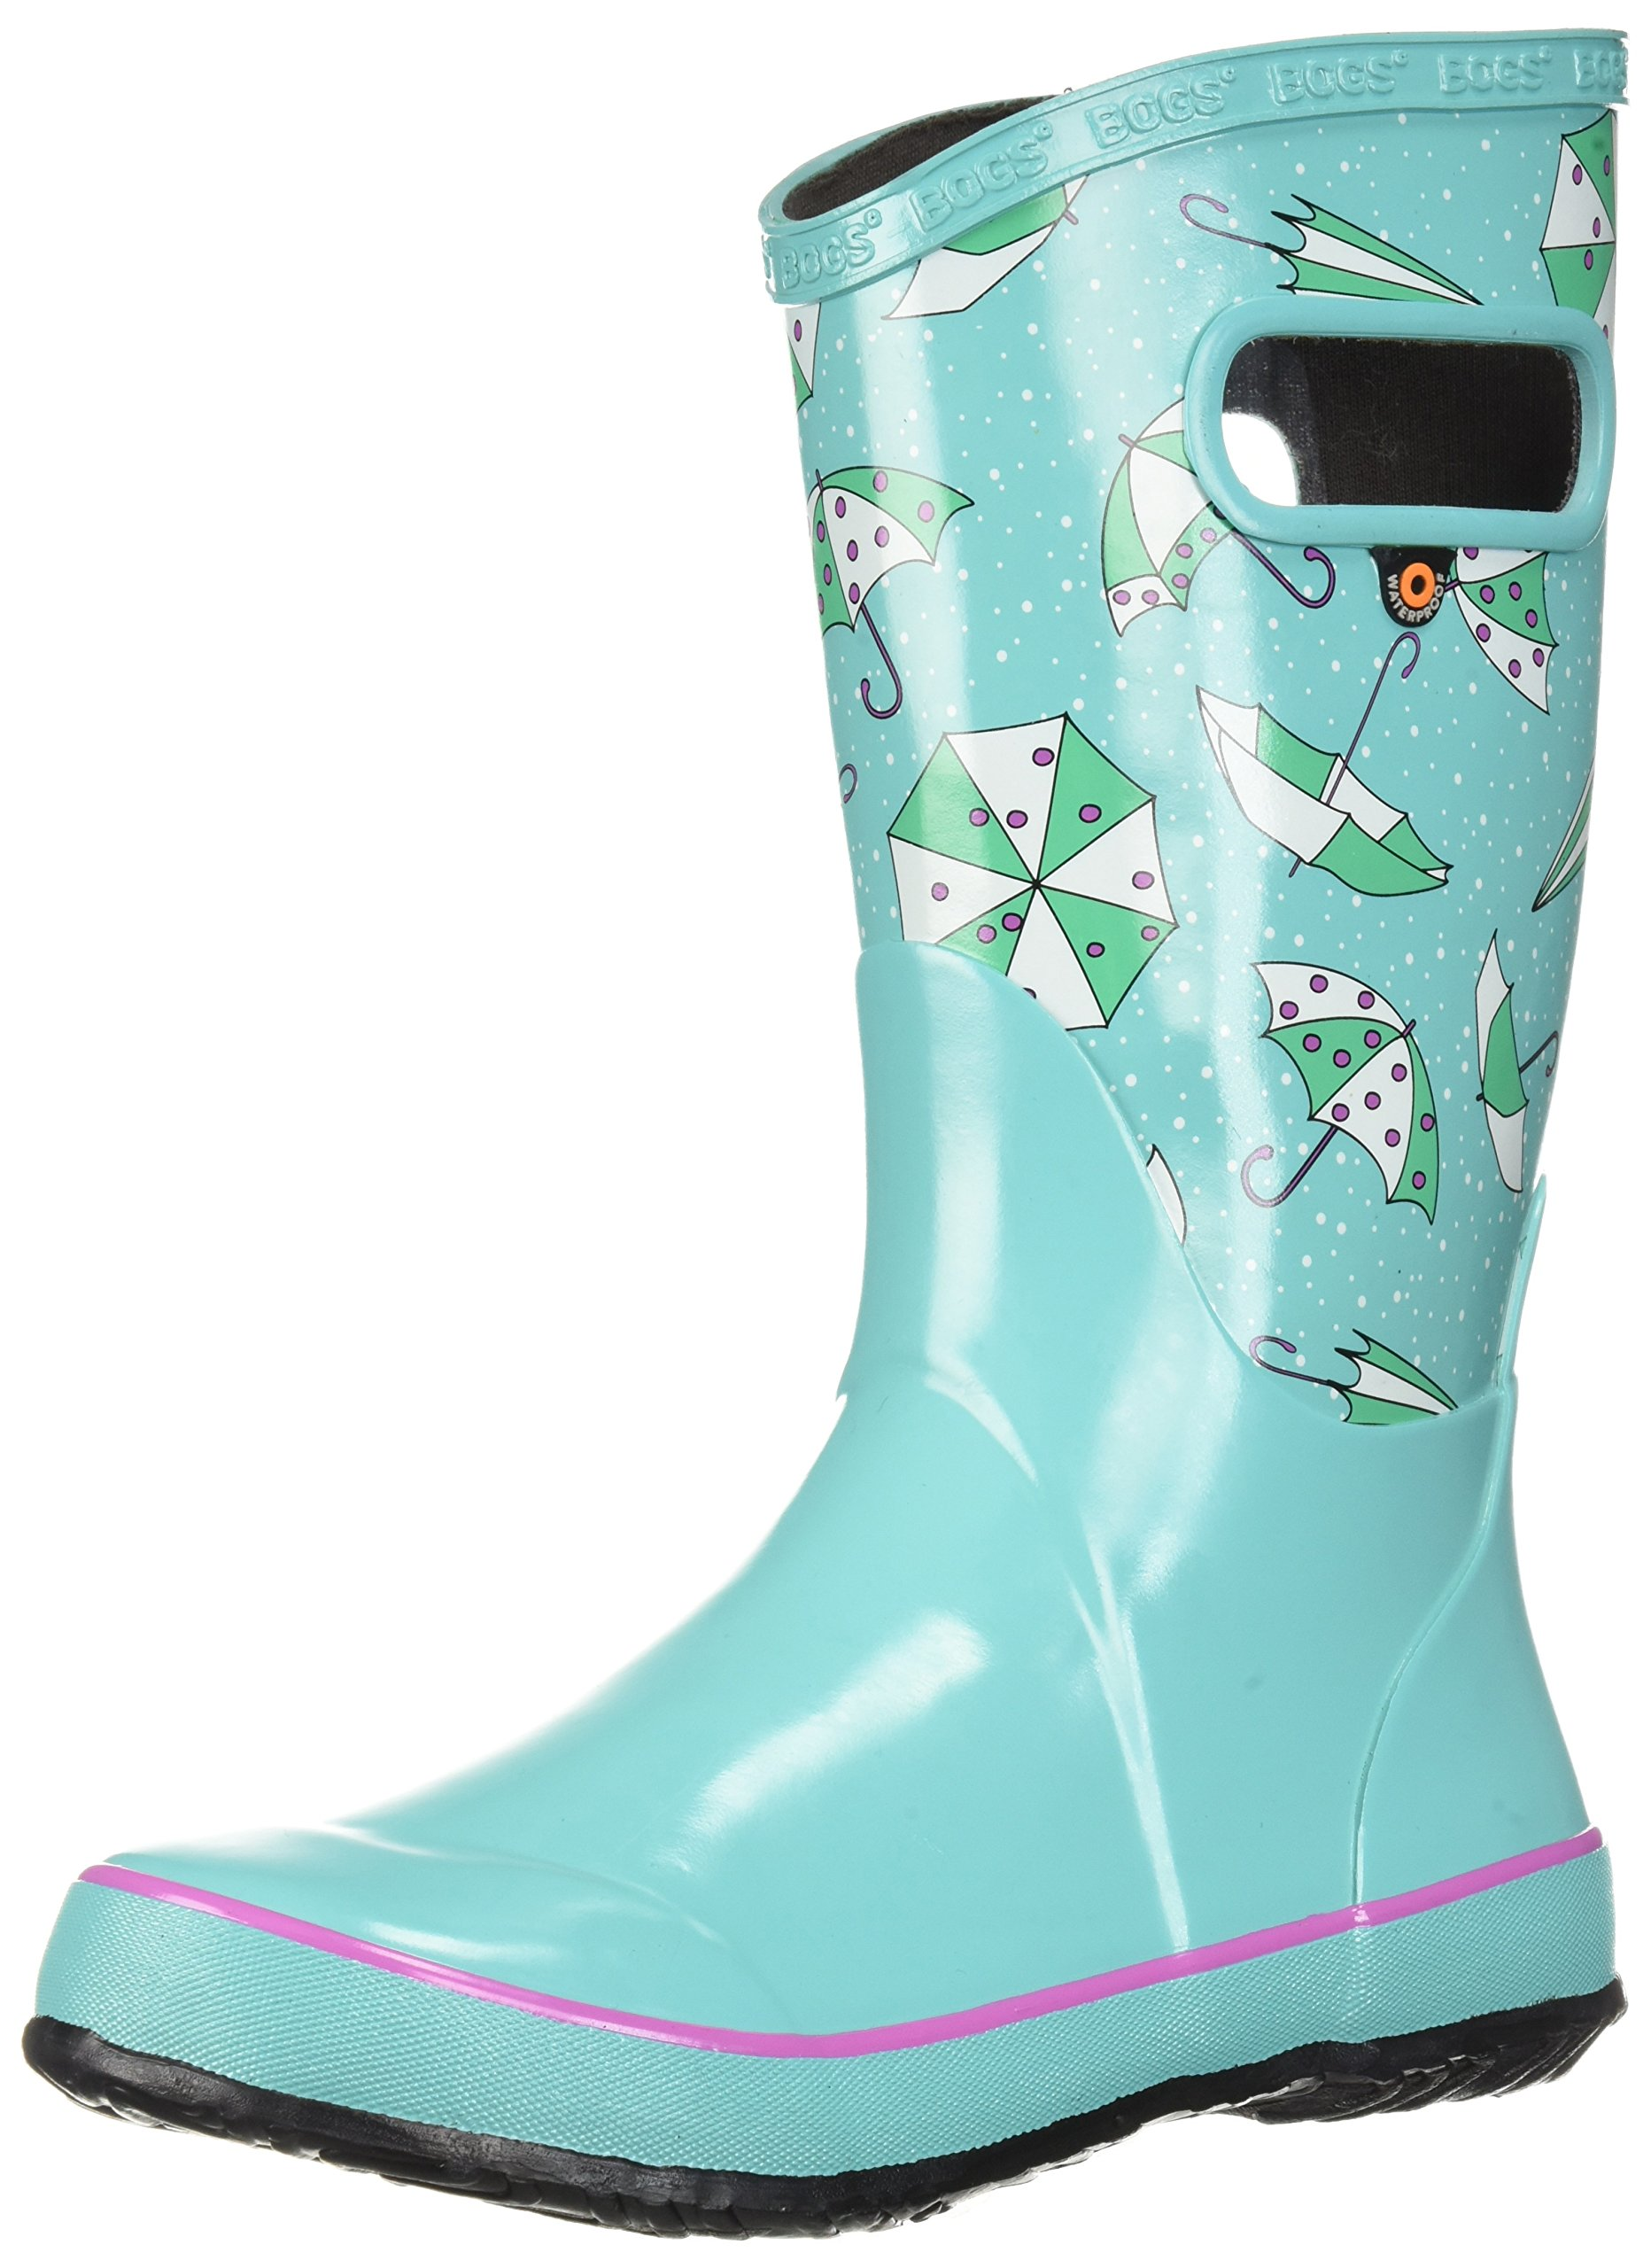 Bogs Kids Rubber Waterproof Rain Boot for Boys and Girls, Umbrellas Print/Turquoise/Multi, 2 M US Little Kid